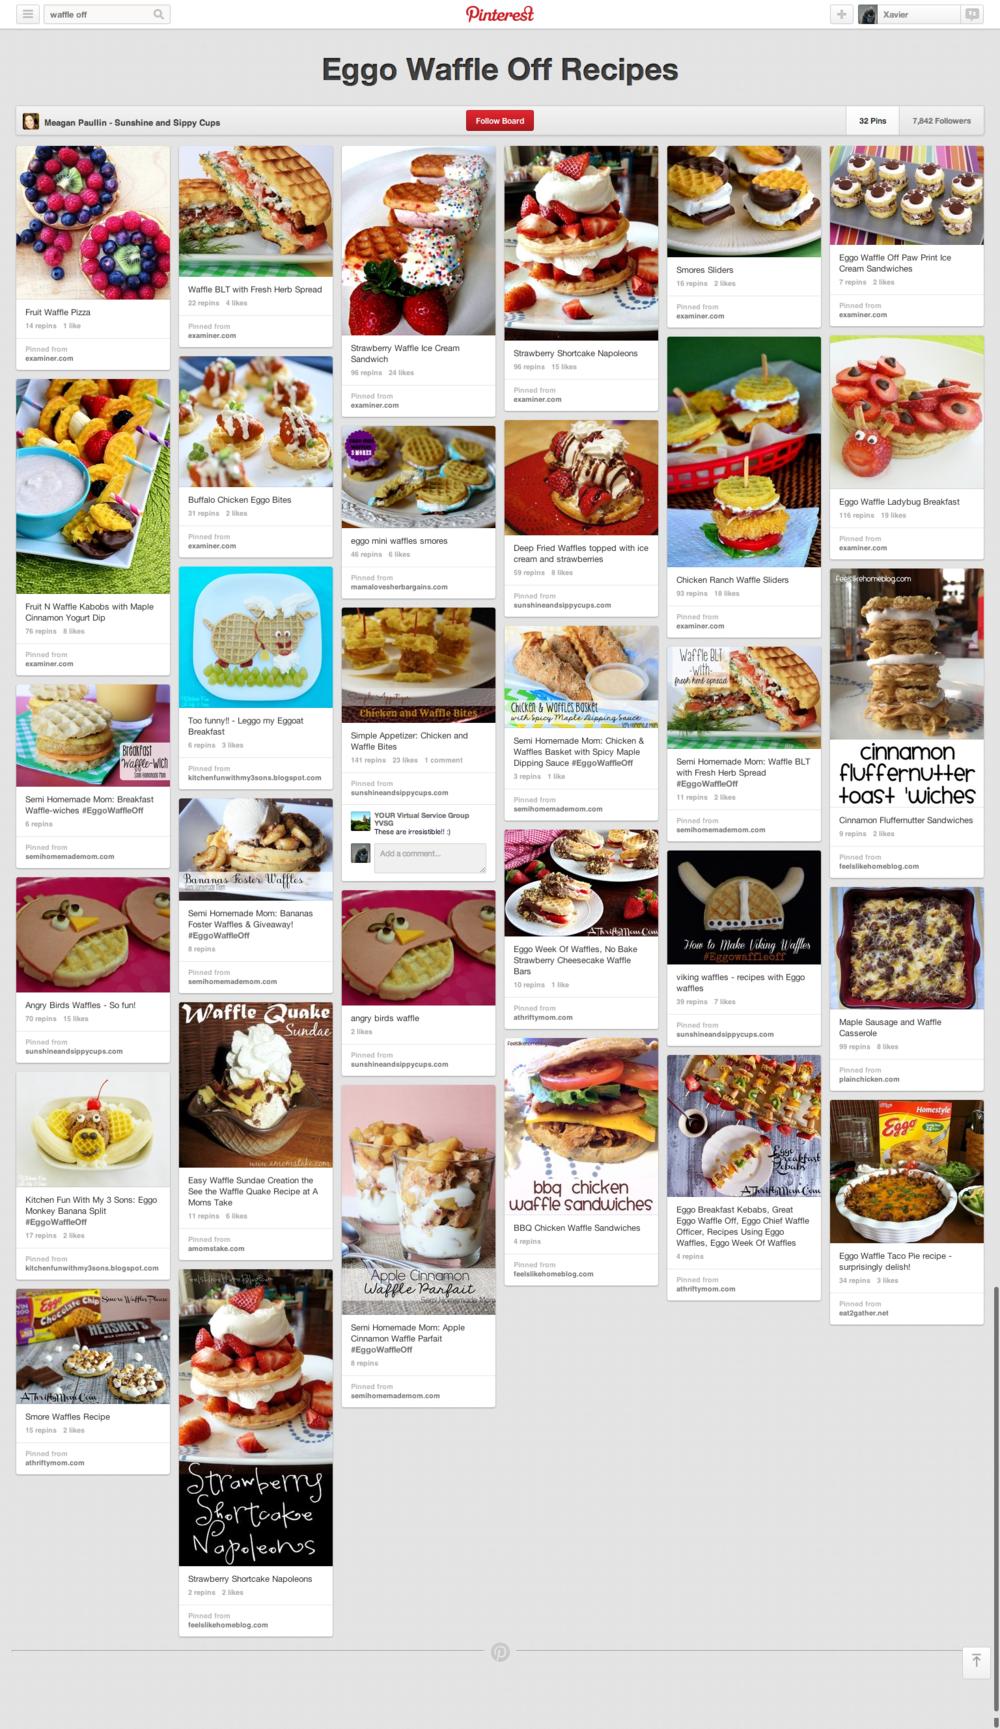 Pinterest_Eggo Waffle Off Recipes.png